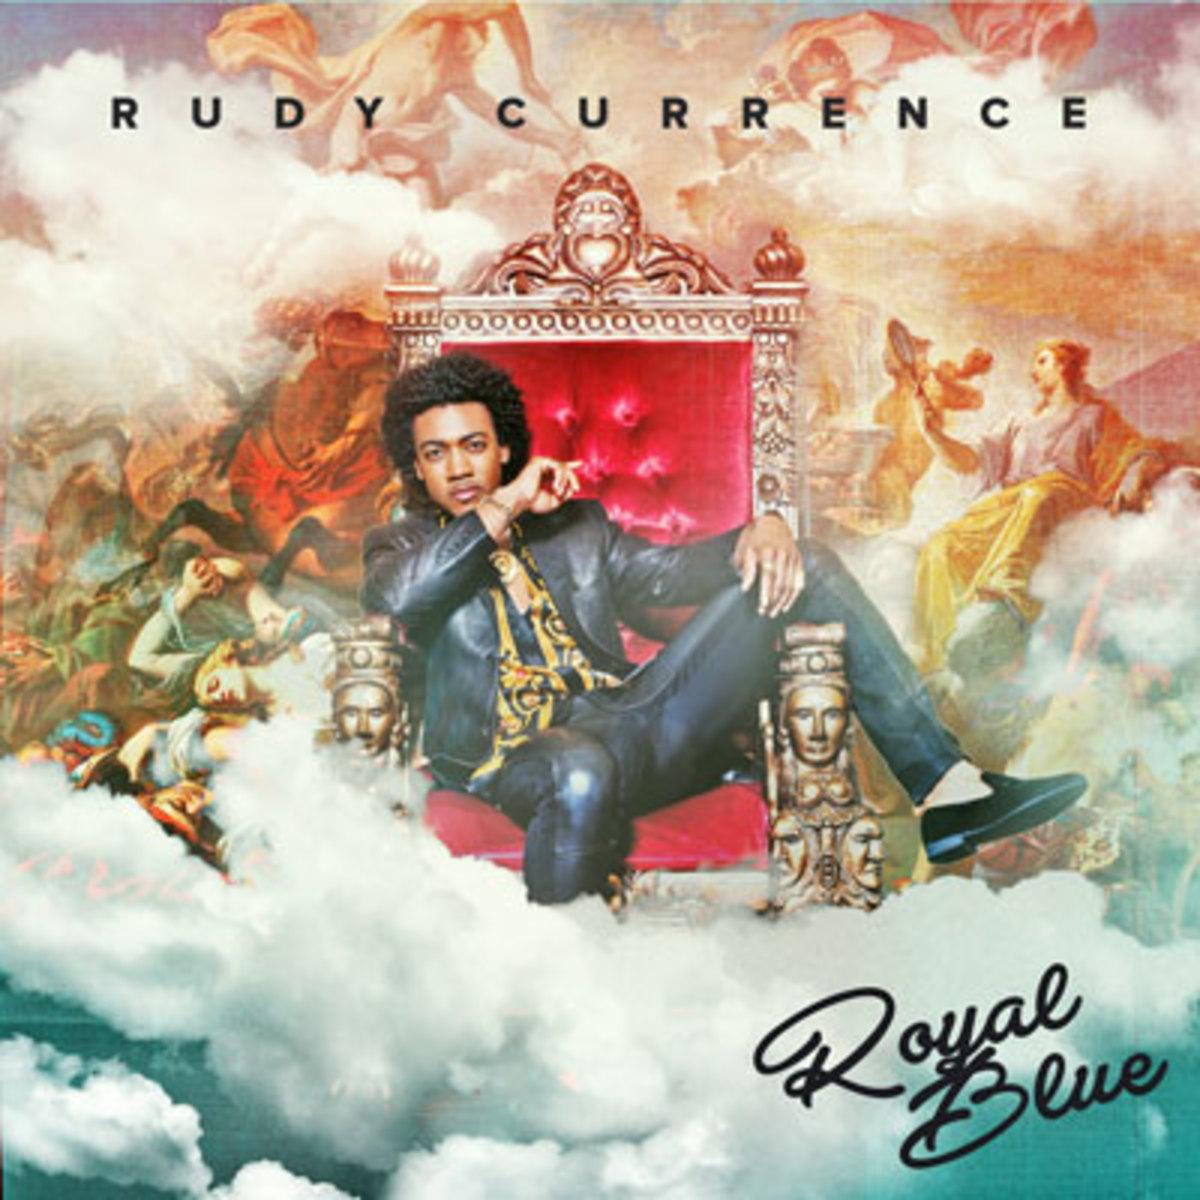 rudy-currence-royal-blue.jpg